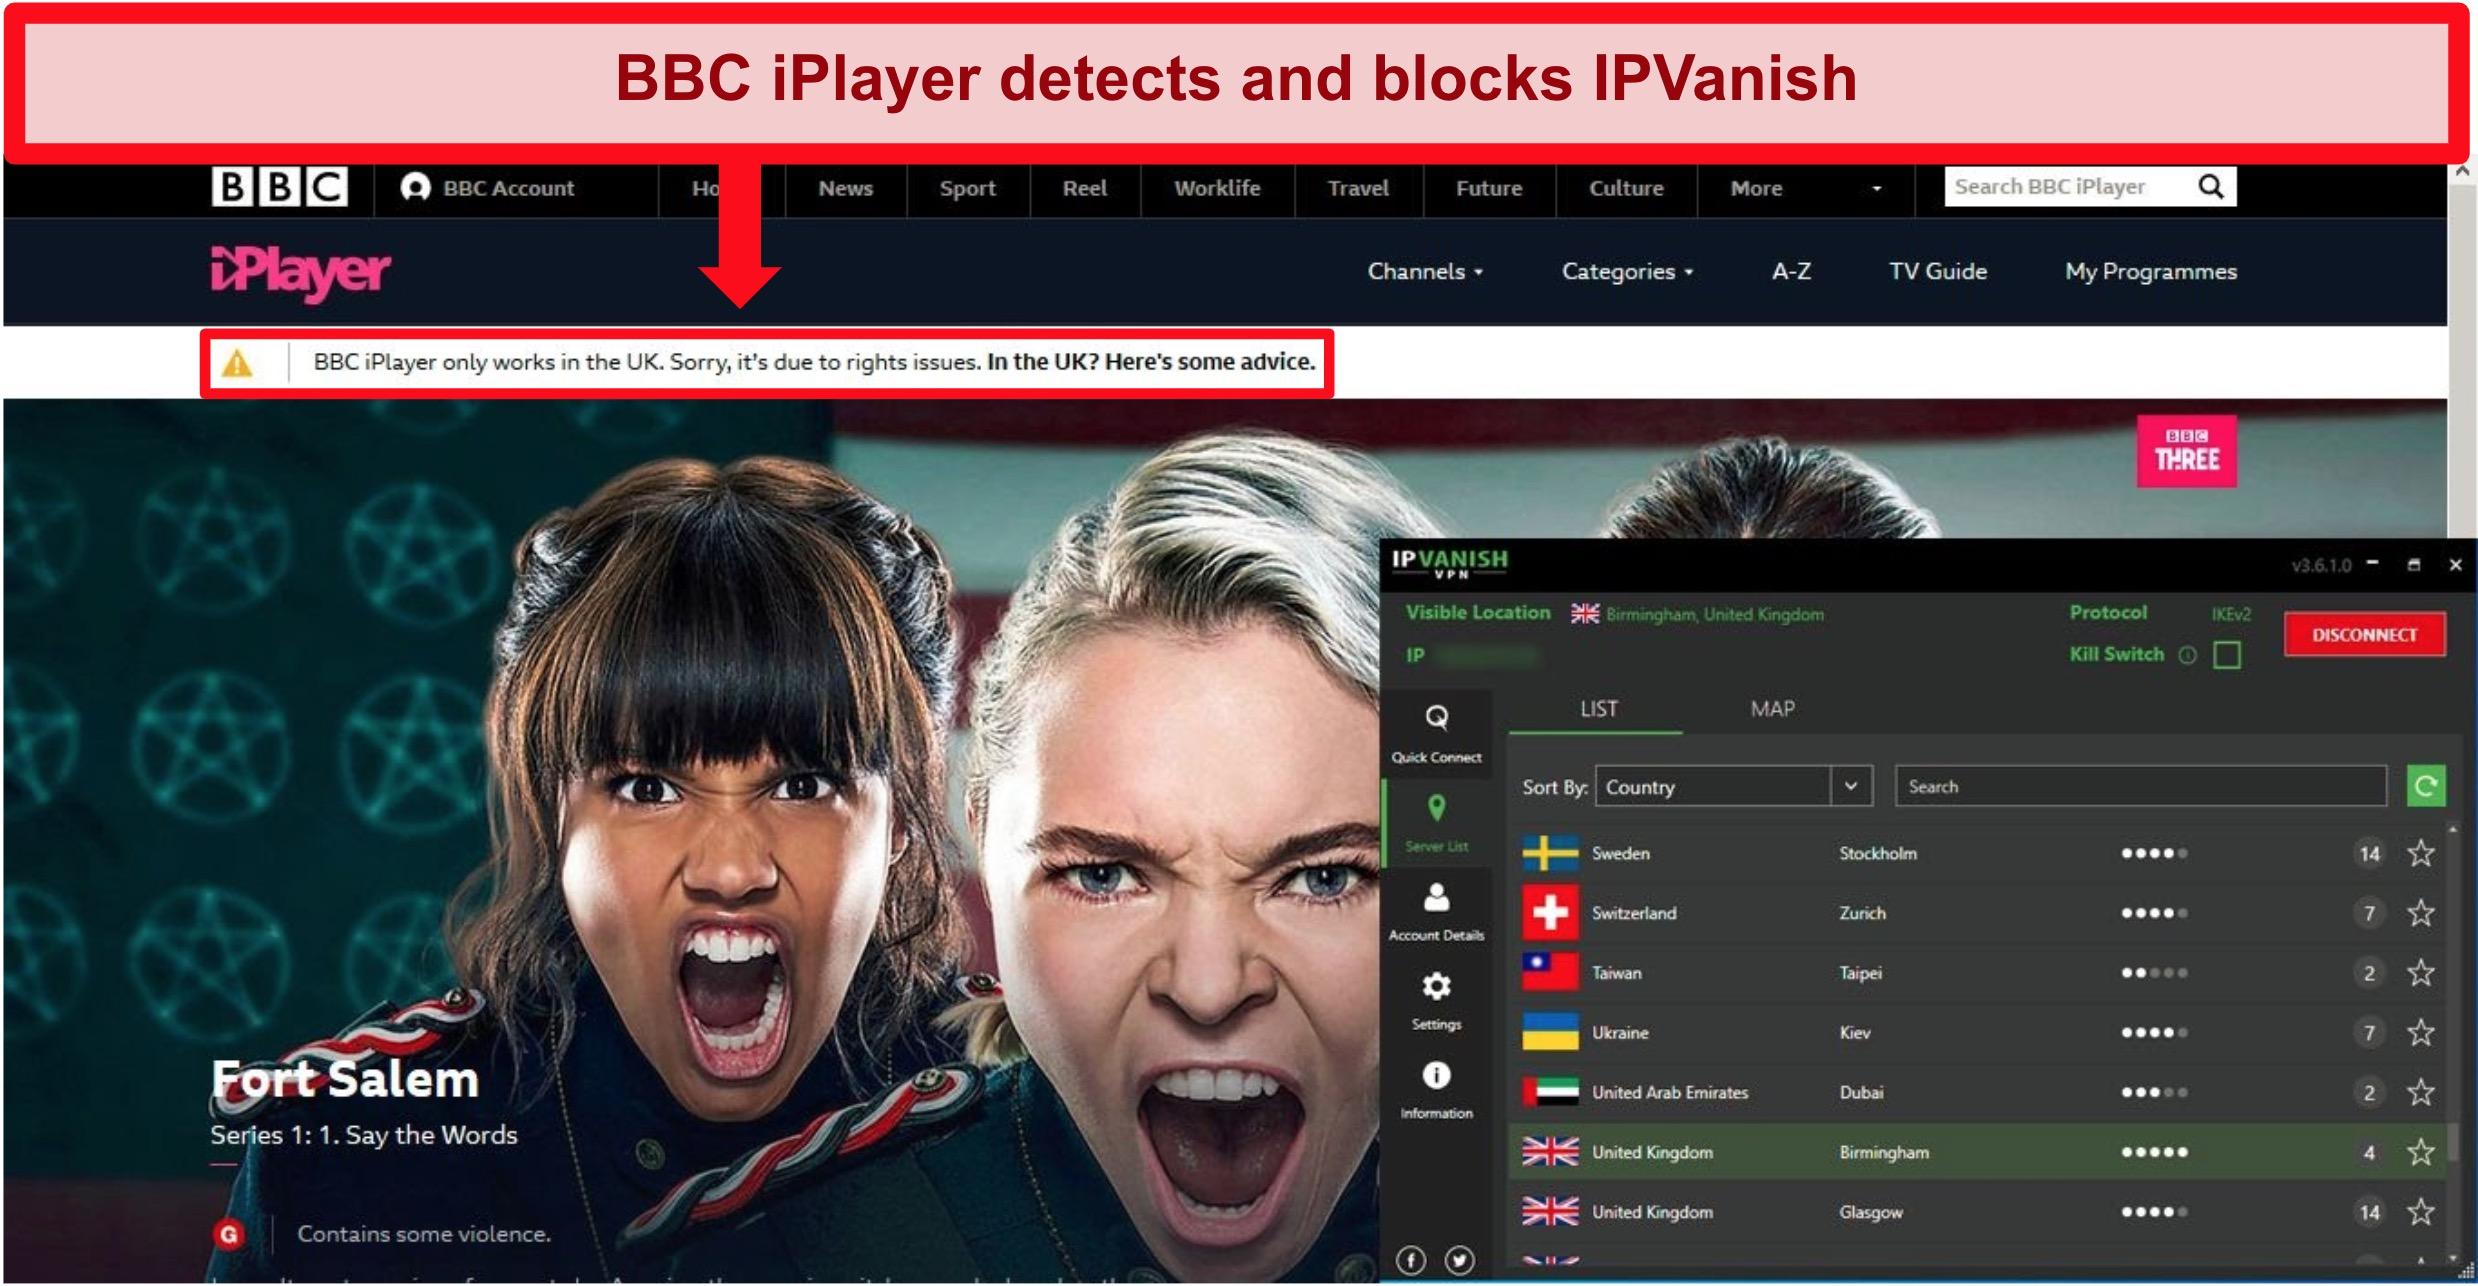 Screenshot of BBC iPlayer displaying an error message while logged into IPVanish's Birmingham, UK server